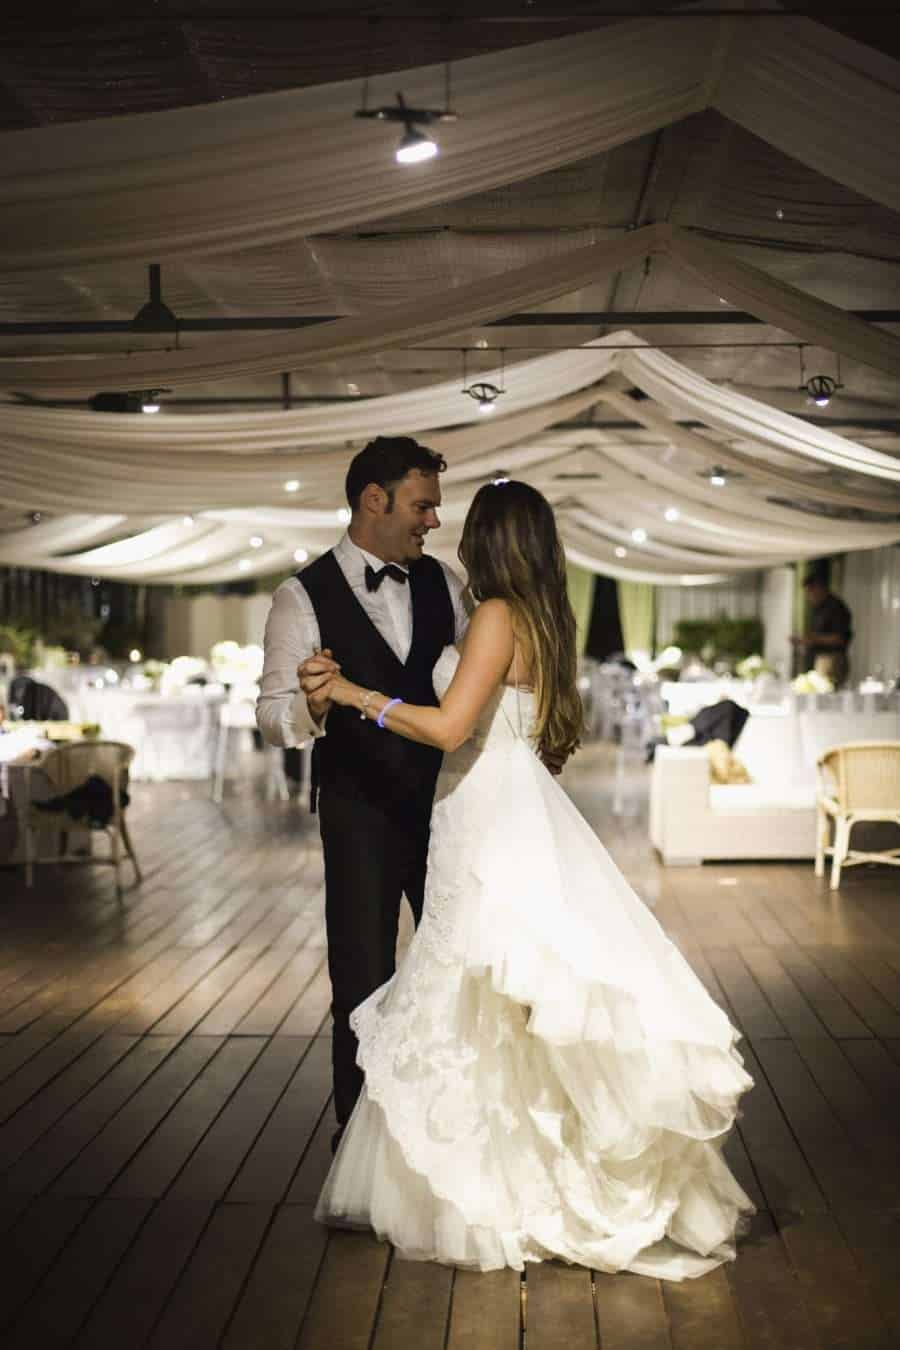 Outdoors Indoors wedding - First dance